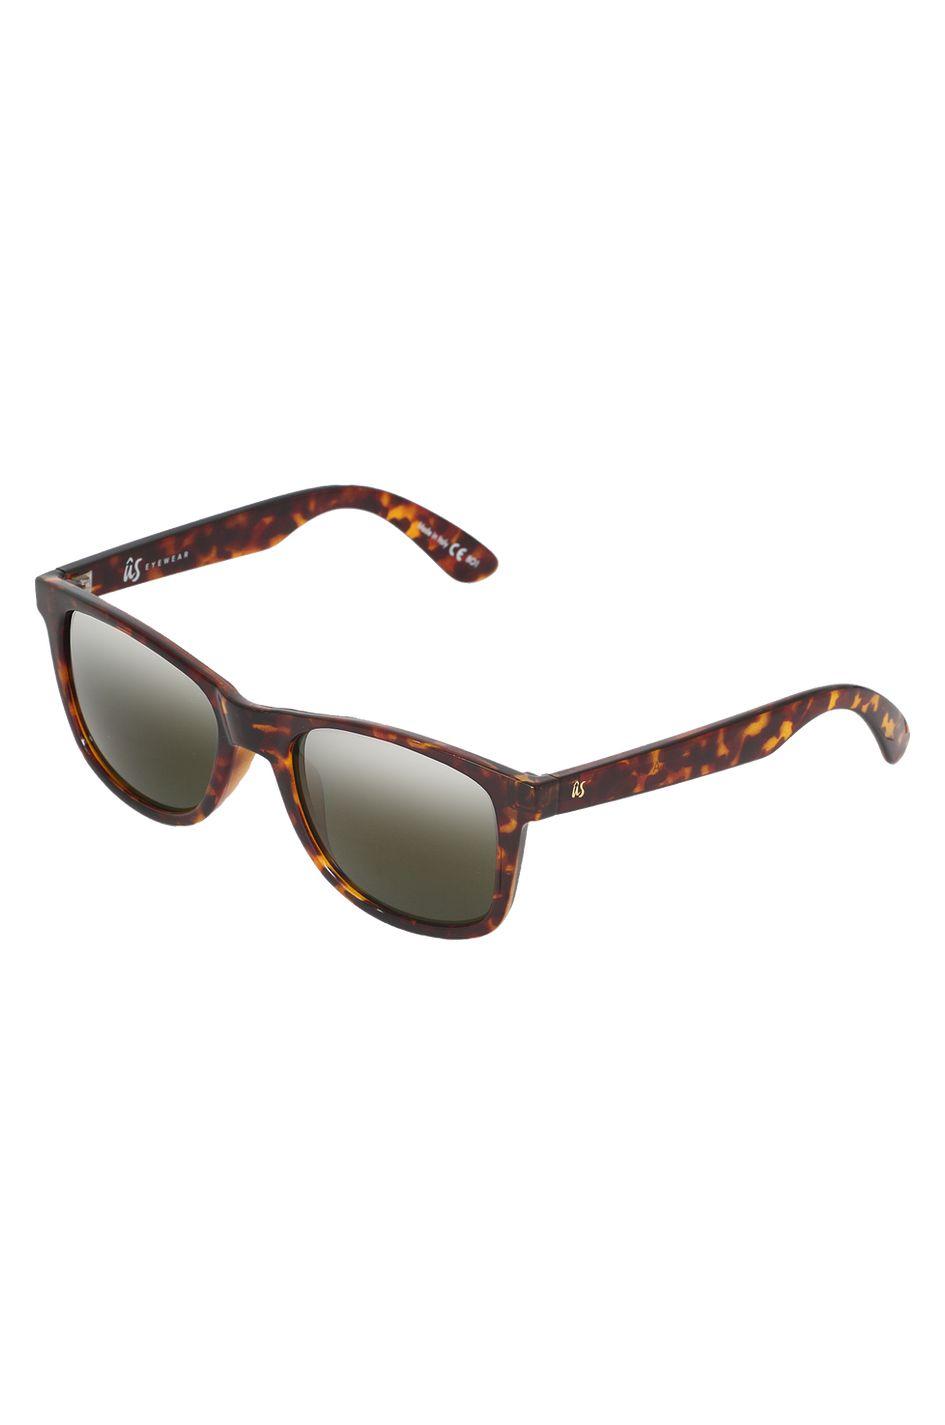 US Sunglasses MATY Gloss Tort/Vintage Grey Polarized